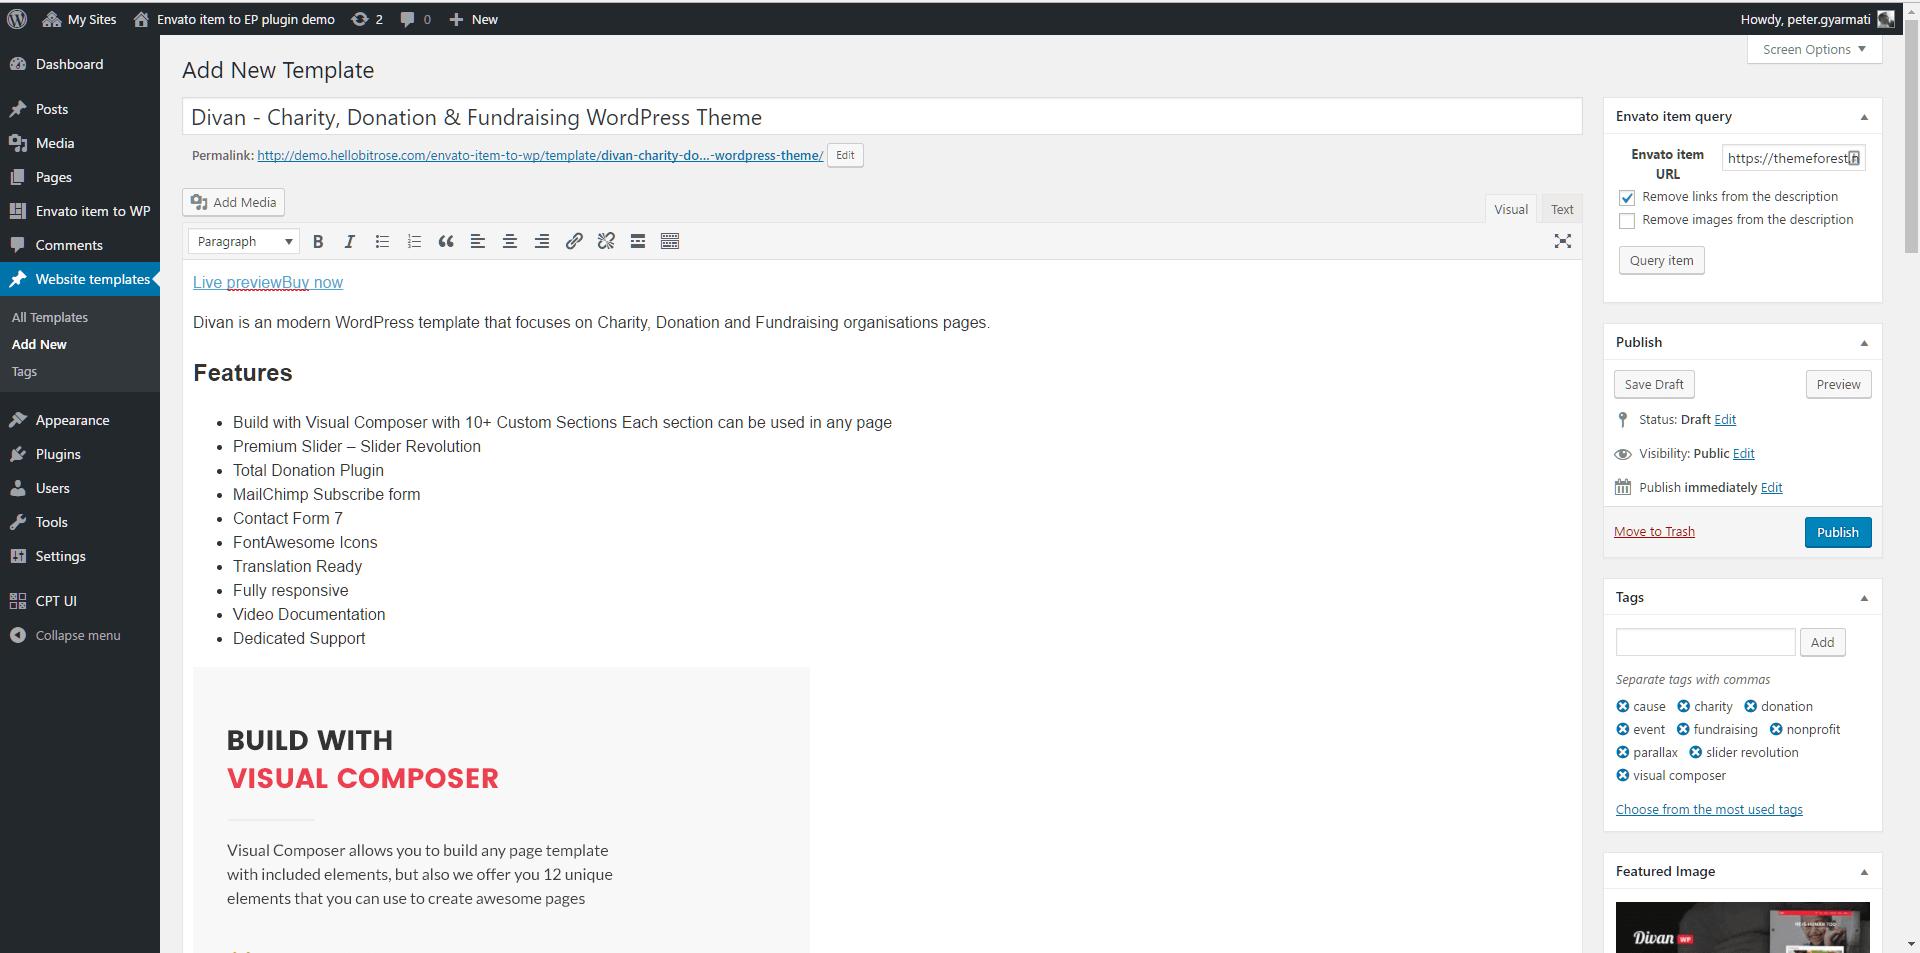 Fetched envato item in WordPress custom post type